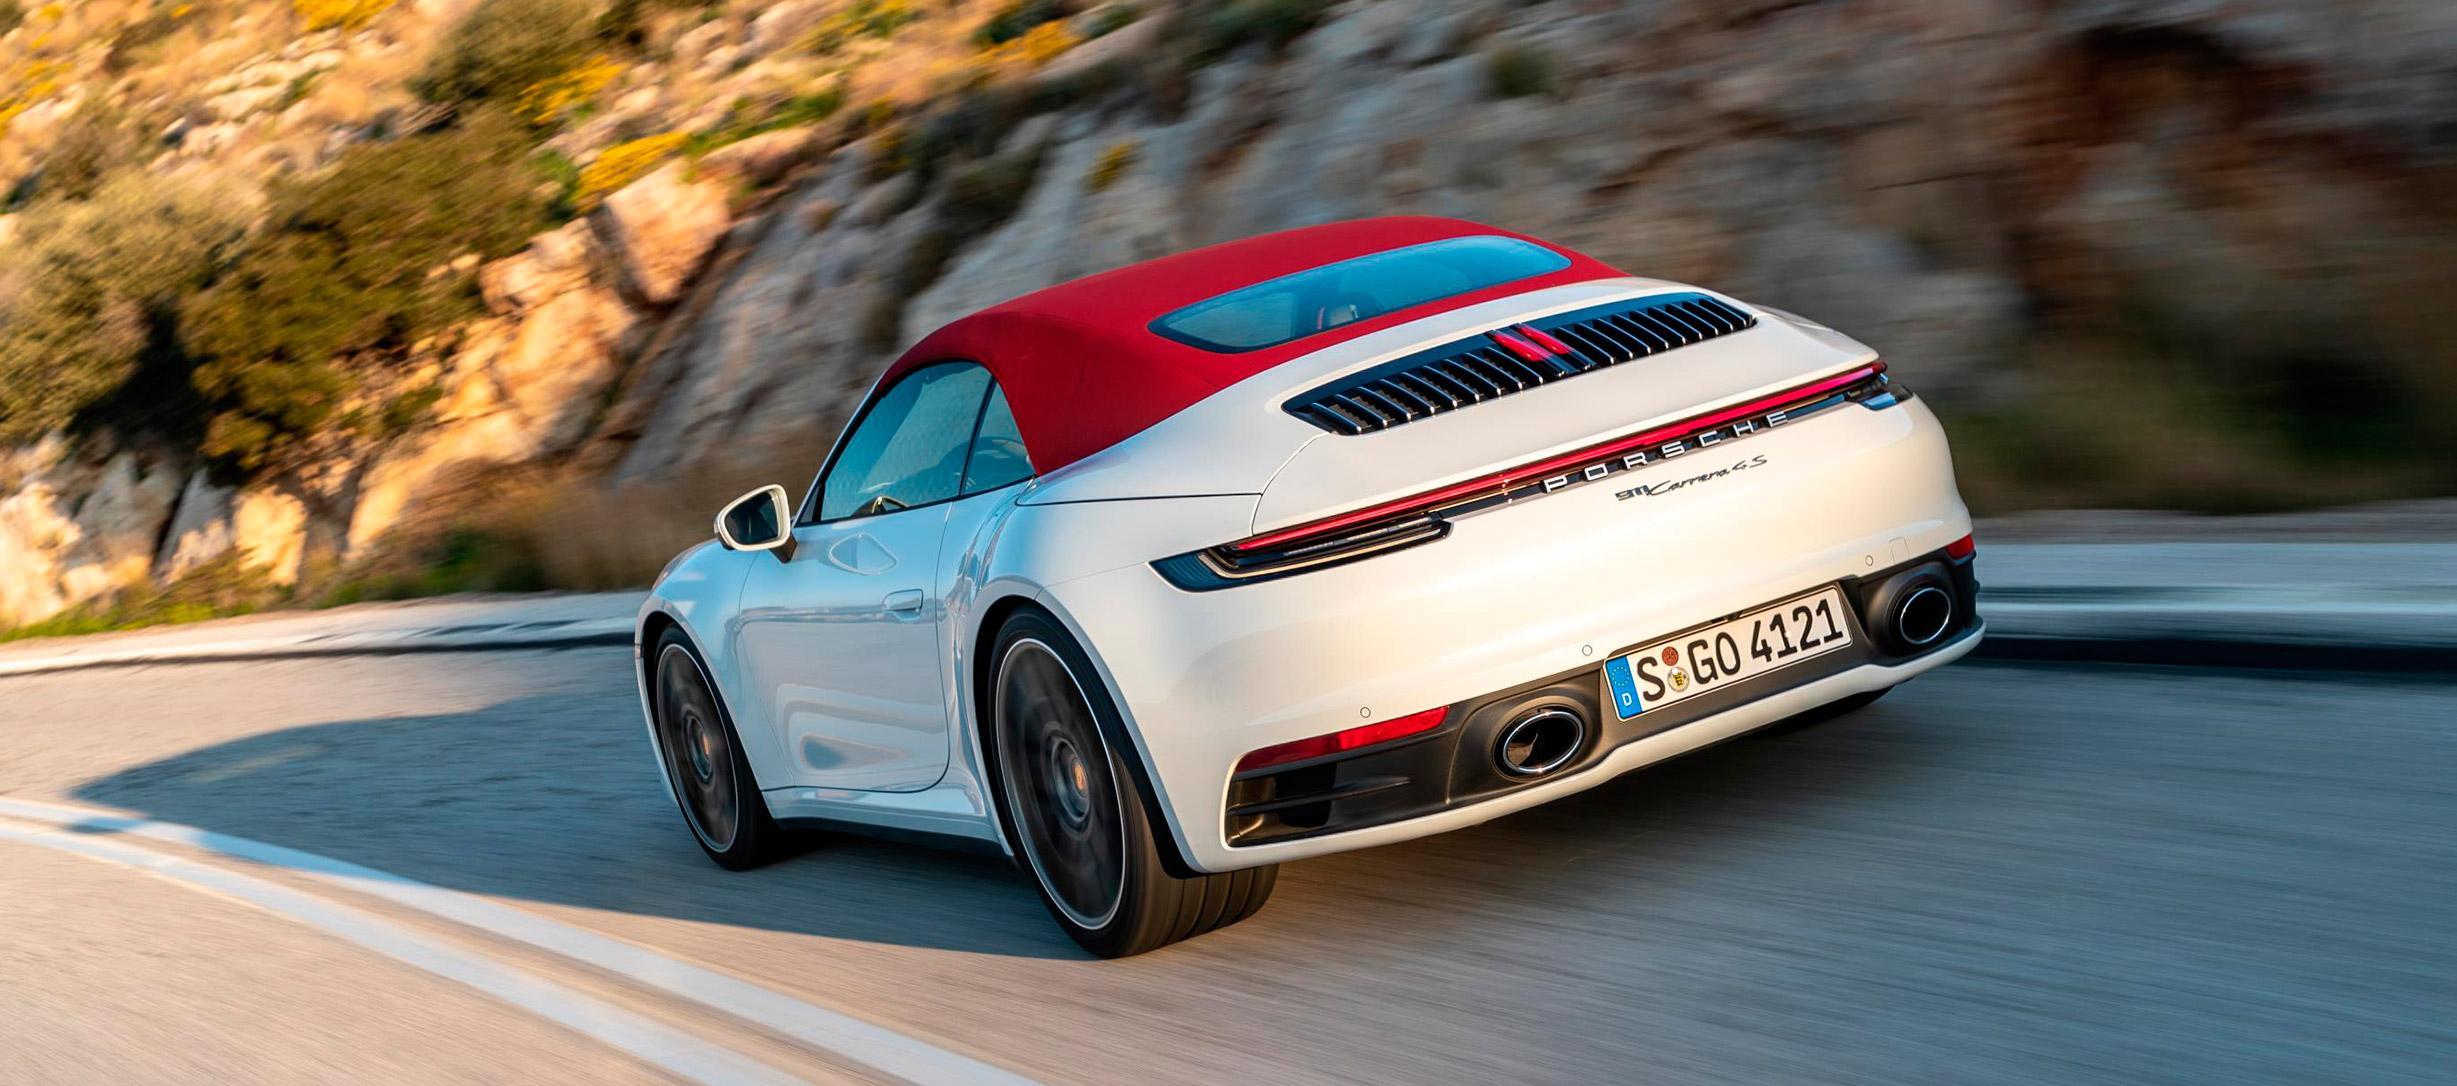 Porsche 911 Cabrio, con nueva capota de alta tecnología